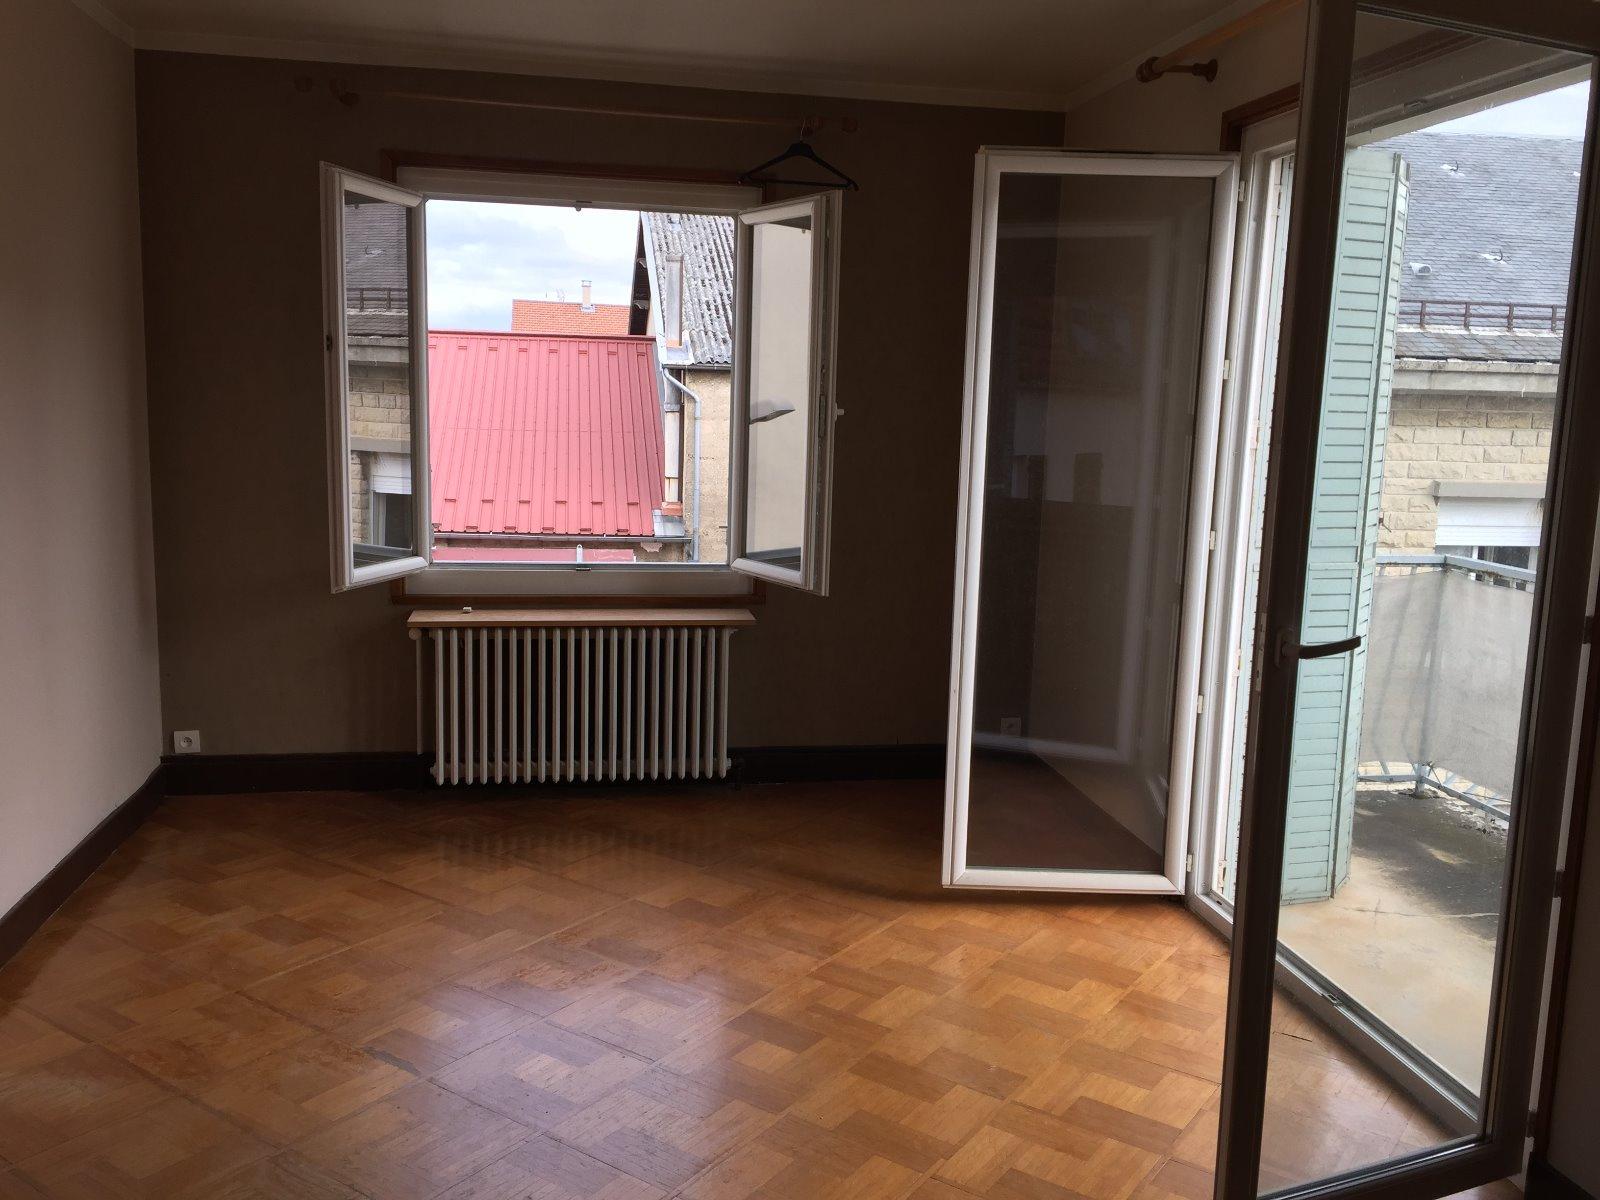 ventes immo a saisir investisseur appartement t3 centre amberieu en bugey rh ne alpes ain. Black Bedroom Furniture Sets. Home Design Ideas